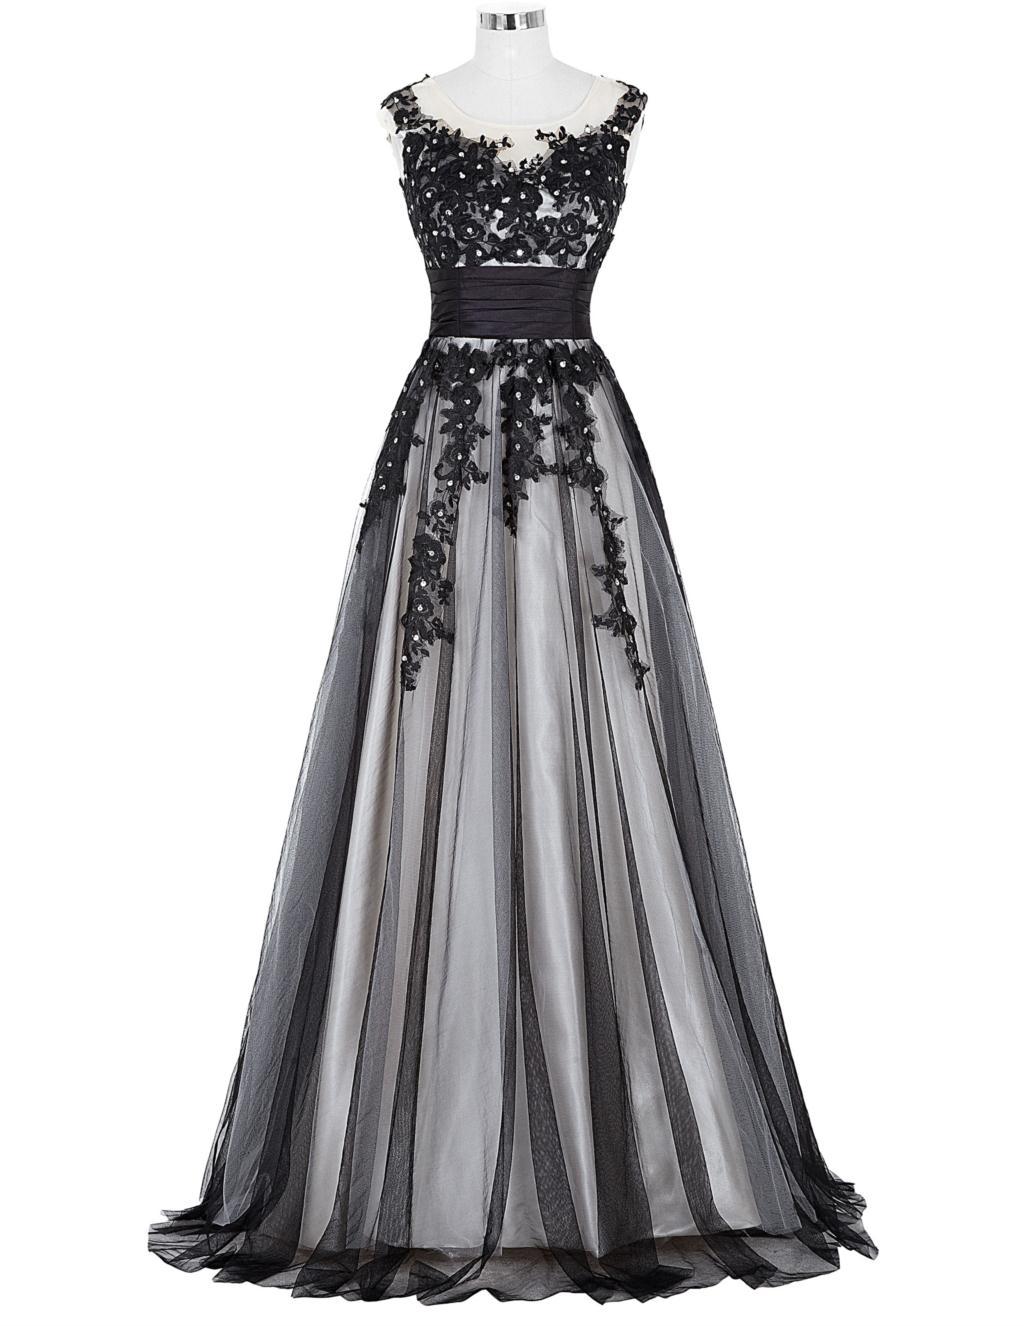 Elegant Lace Appliques Mother of the Bride Dress 14